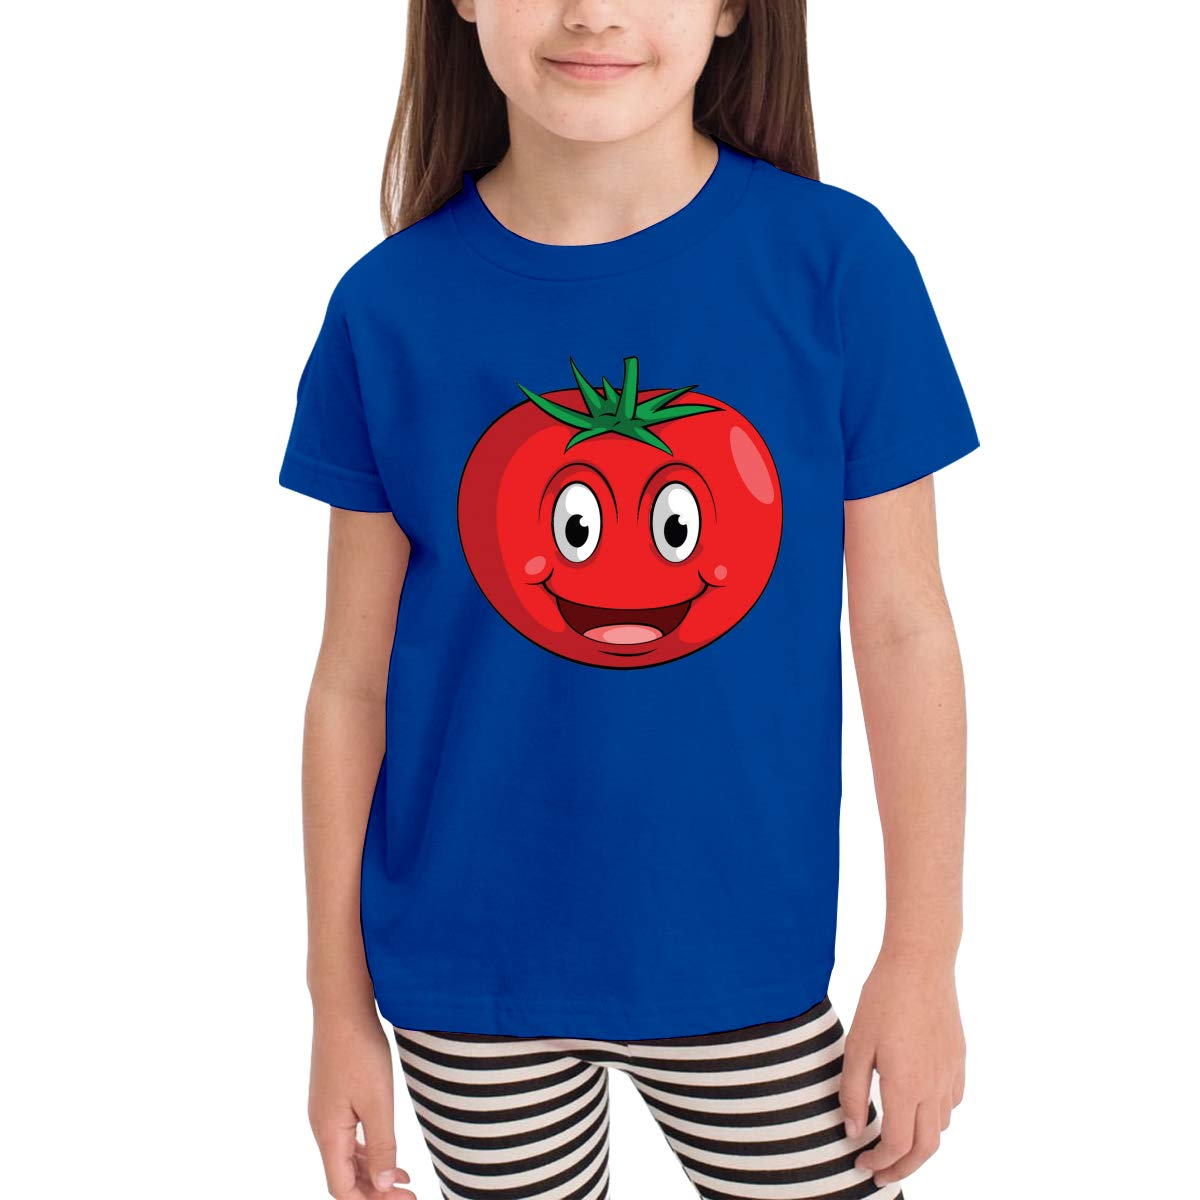 Kids T-Shirt Tops Black Smile Tomato Unisex Youths Short Sleeve T-Shirt